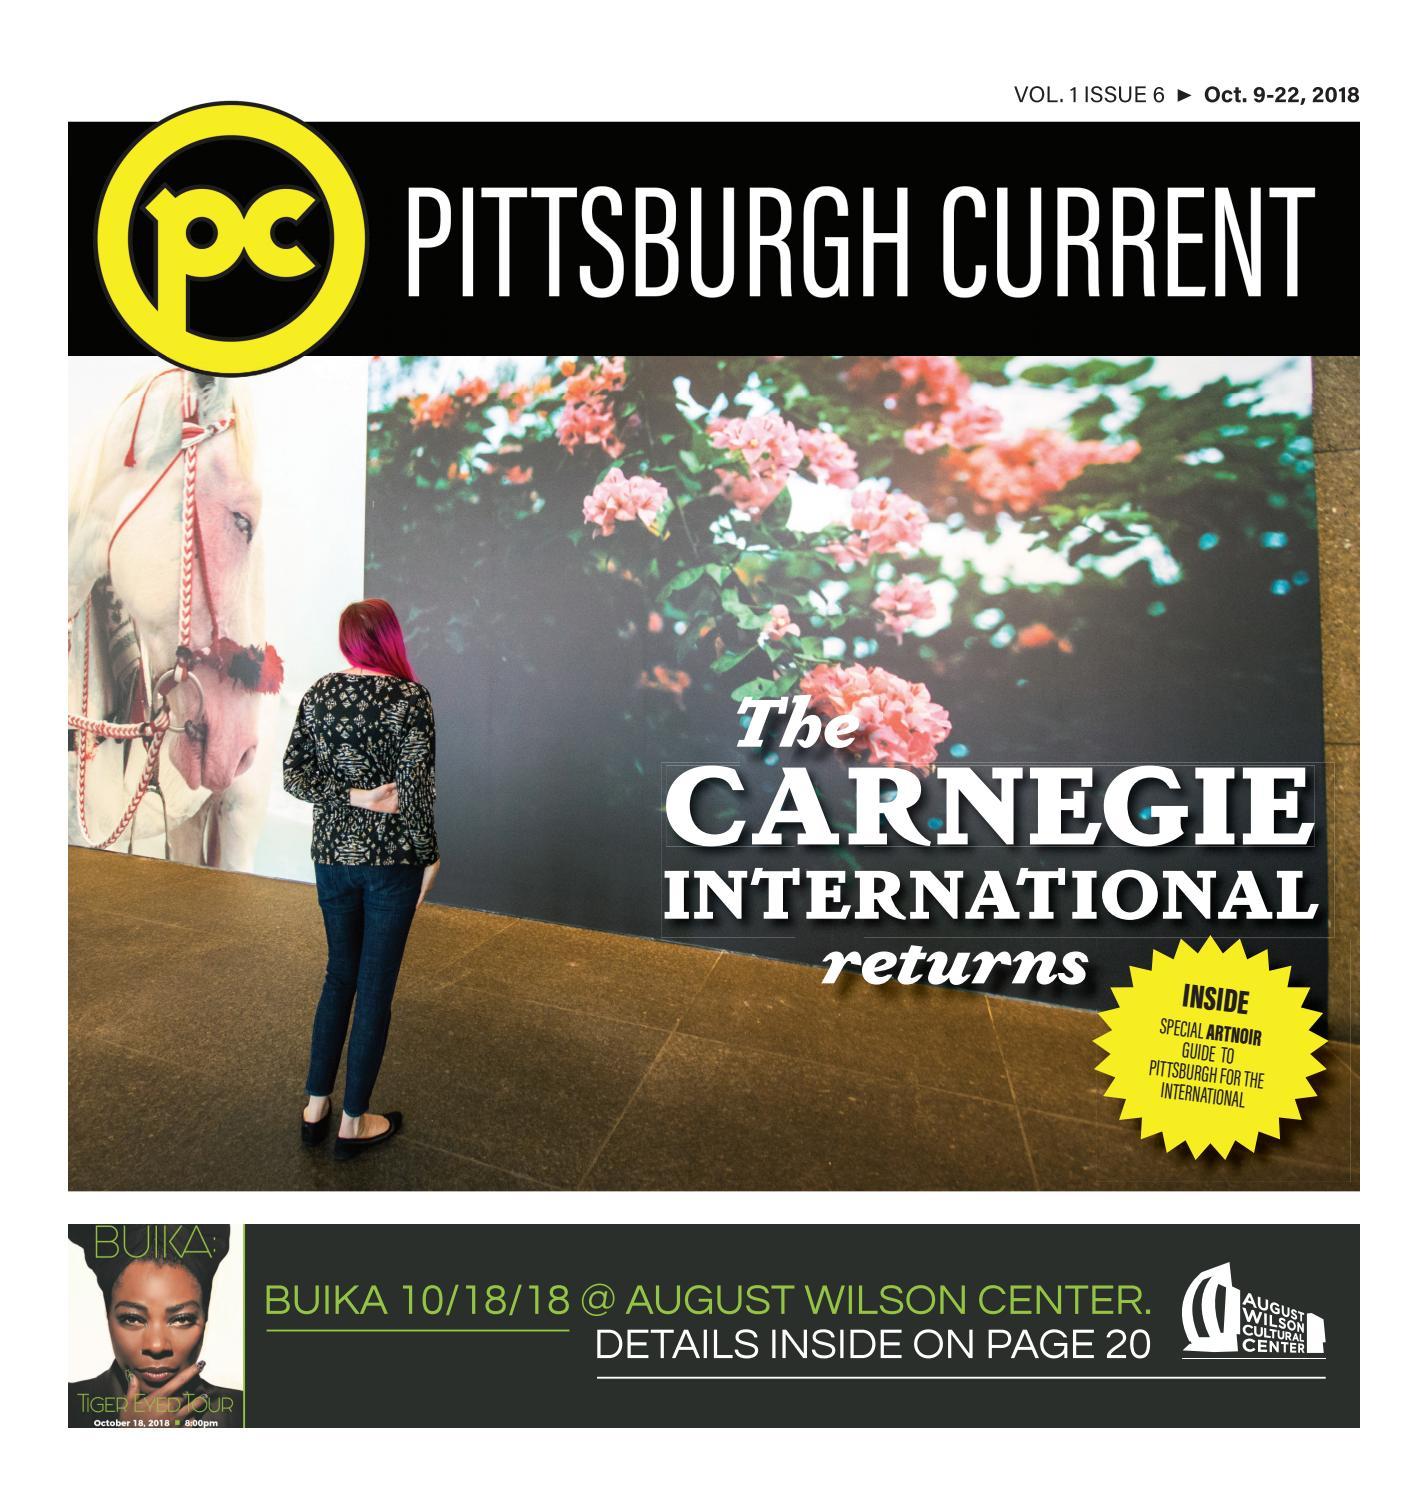 3c41e75a6604 Pittsburgh Current Vol.1